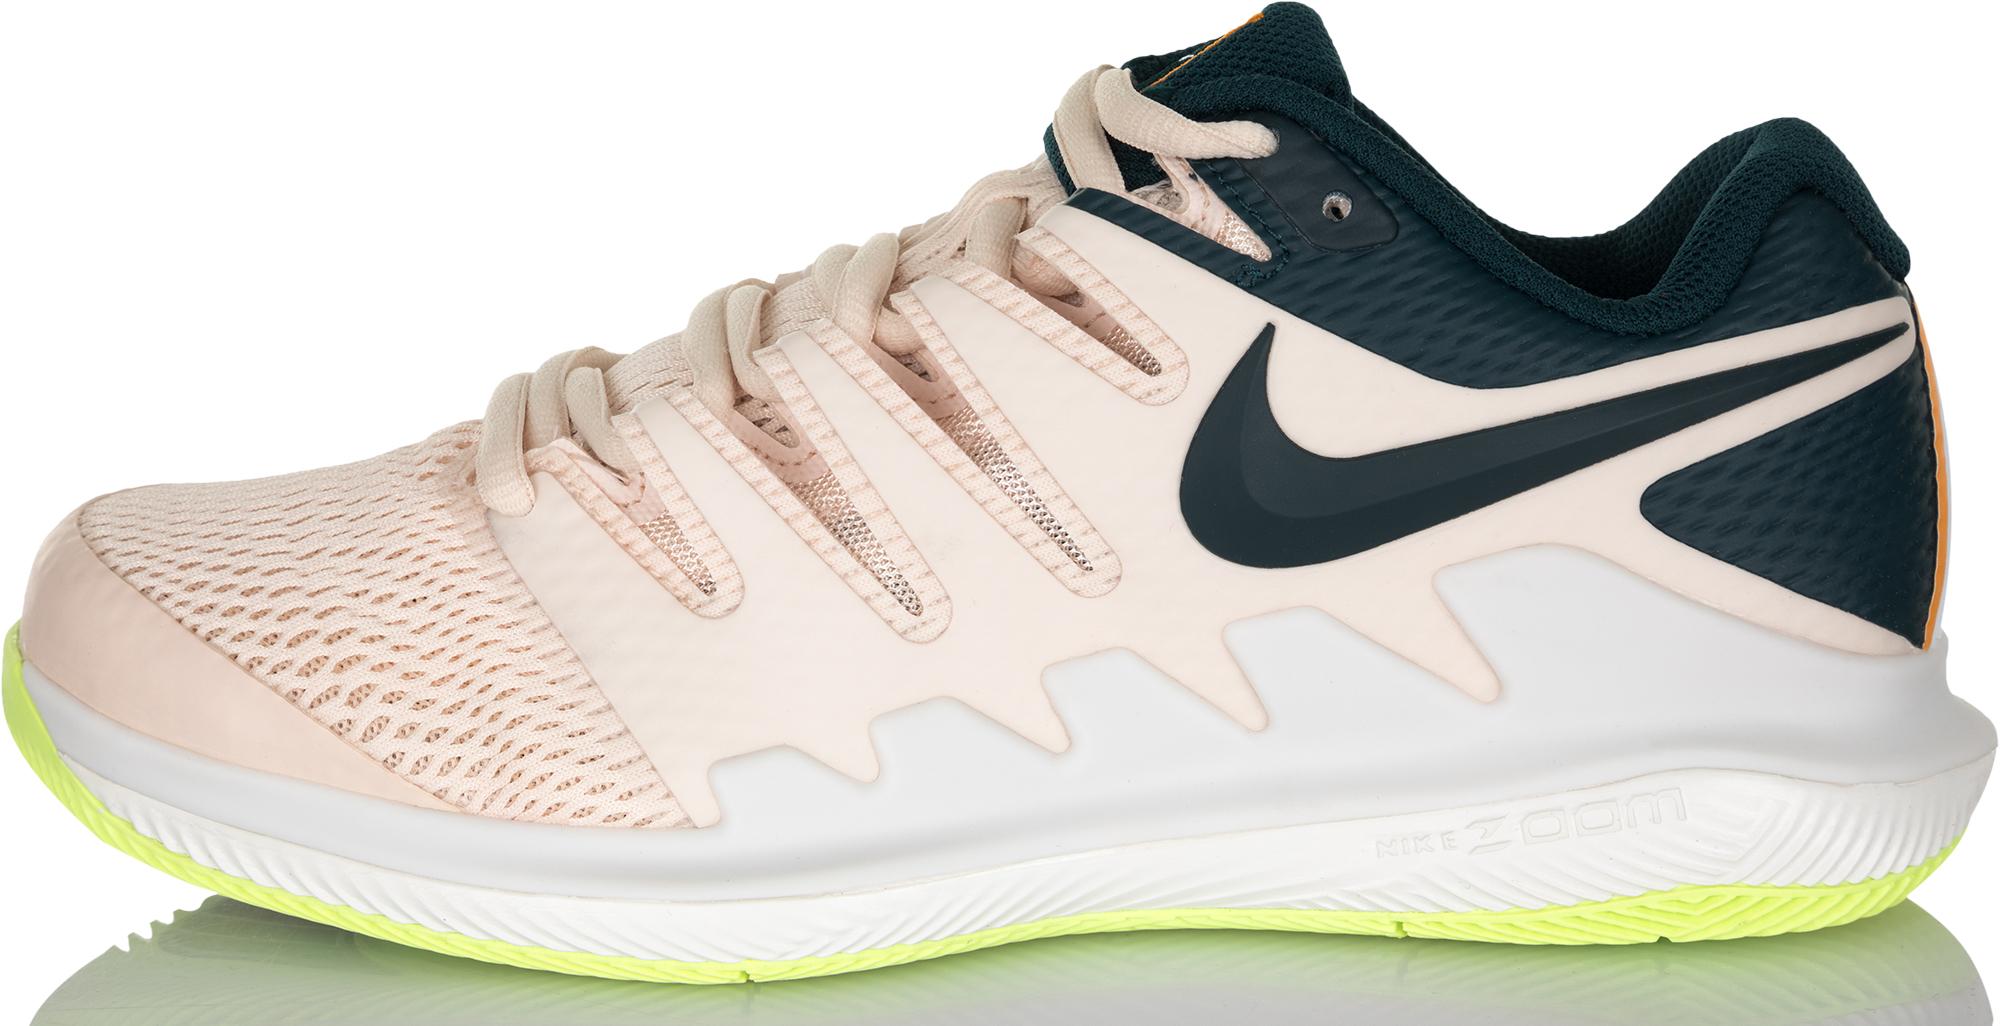 Nike Кроссовки женские Nike Air Zoom Vapor X, размер 40 цена